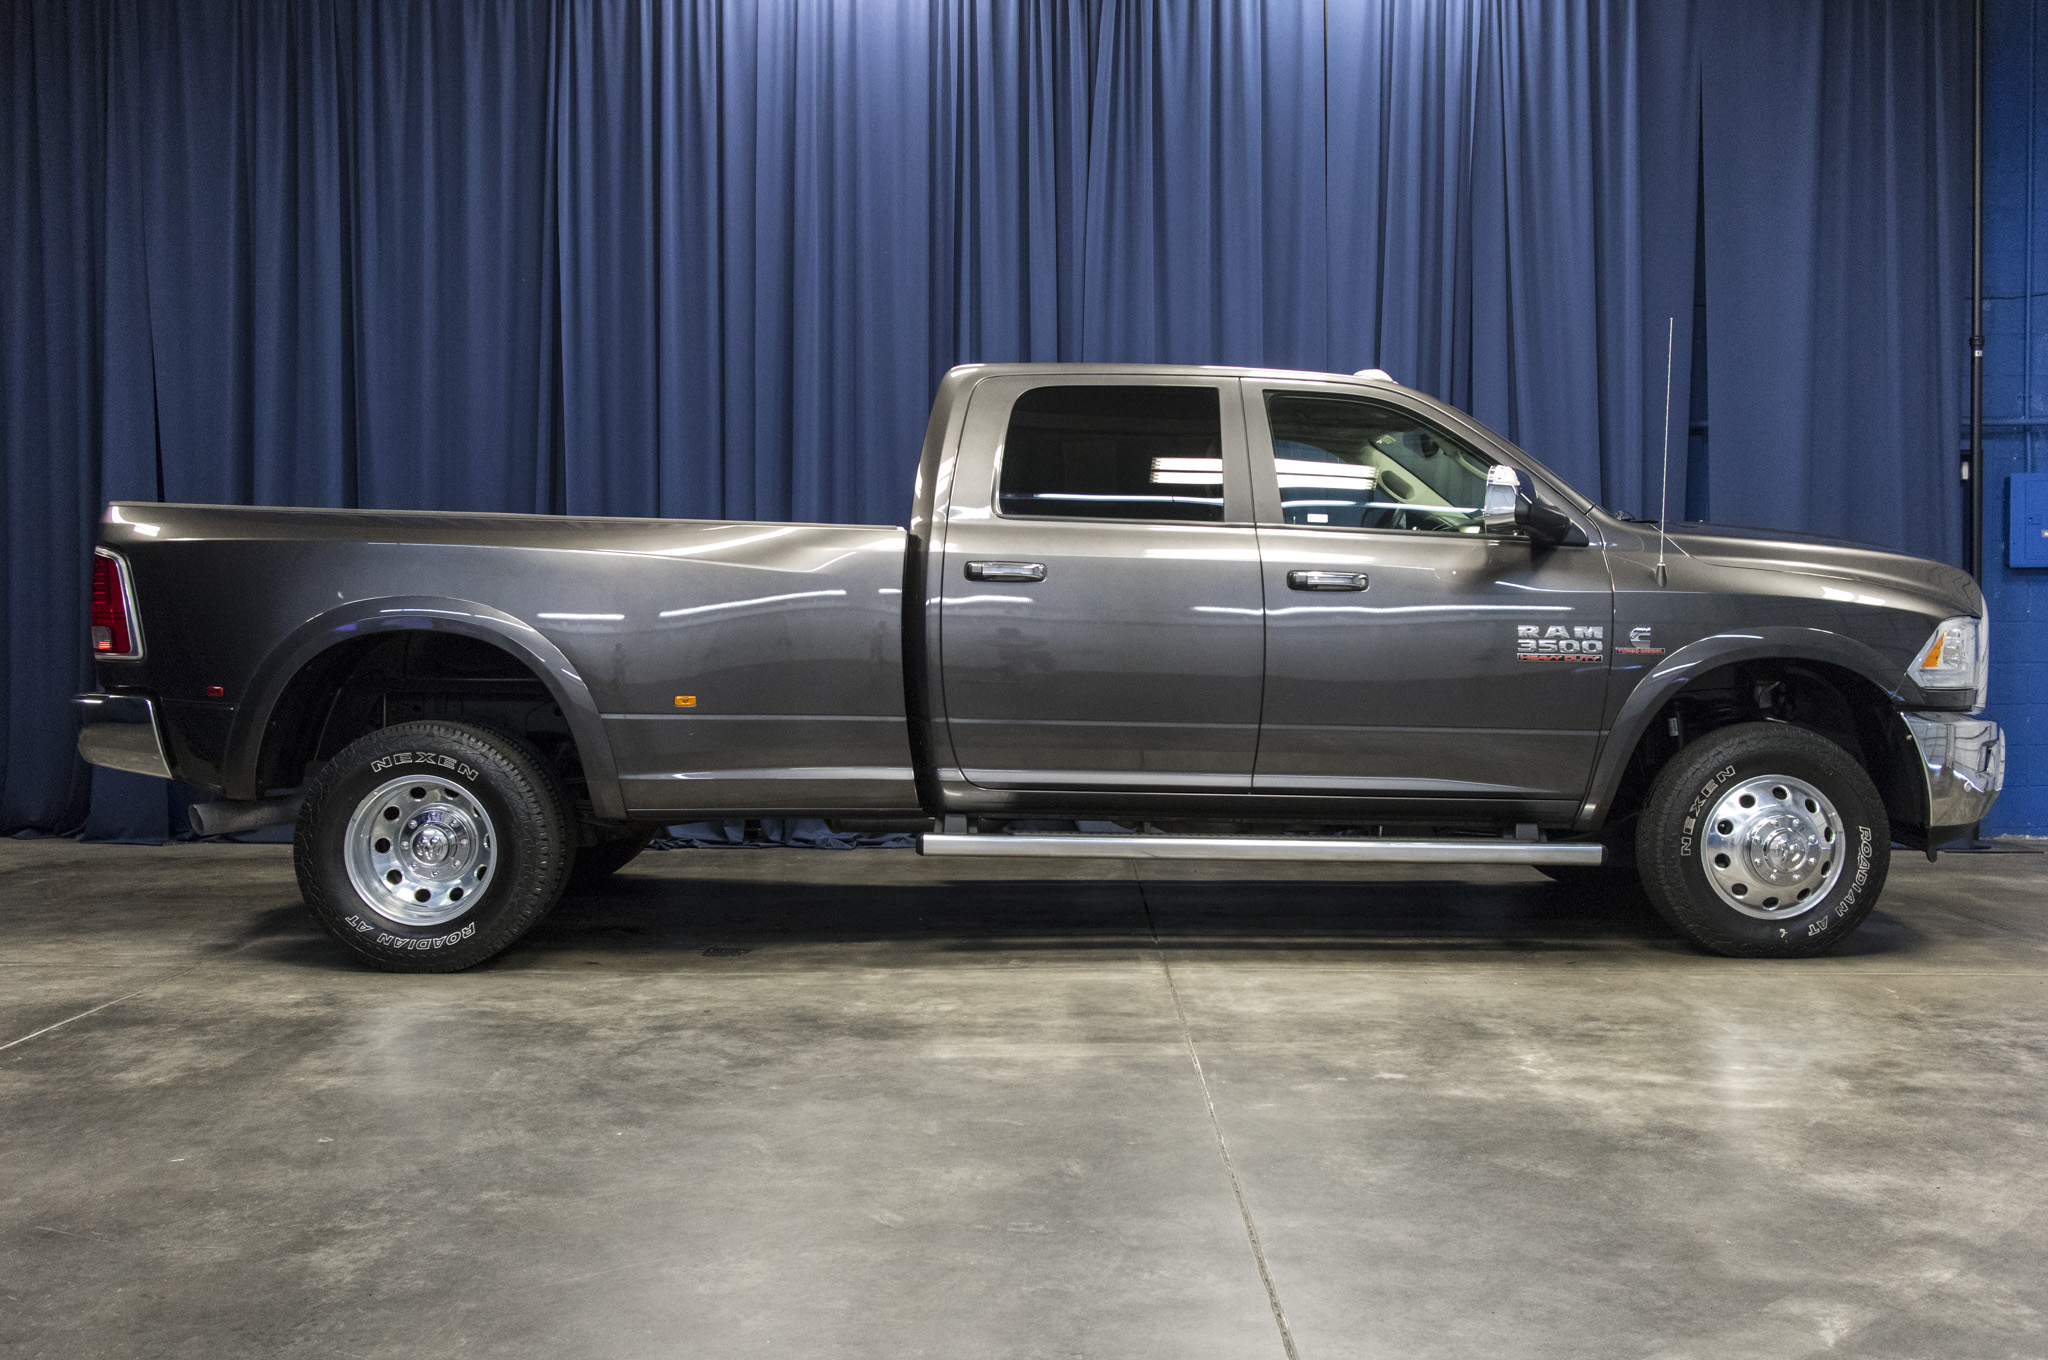 Diesel Trucks Lifted Trucks Used Trucks For Sale Northwest